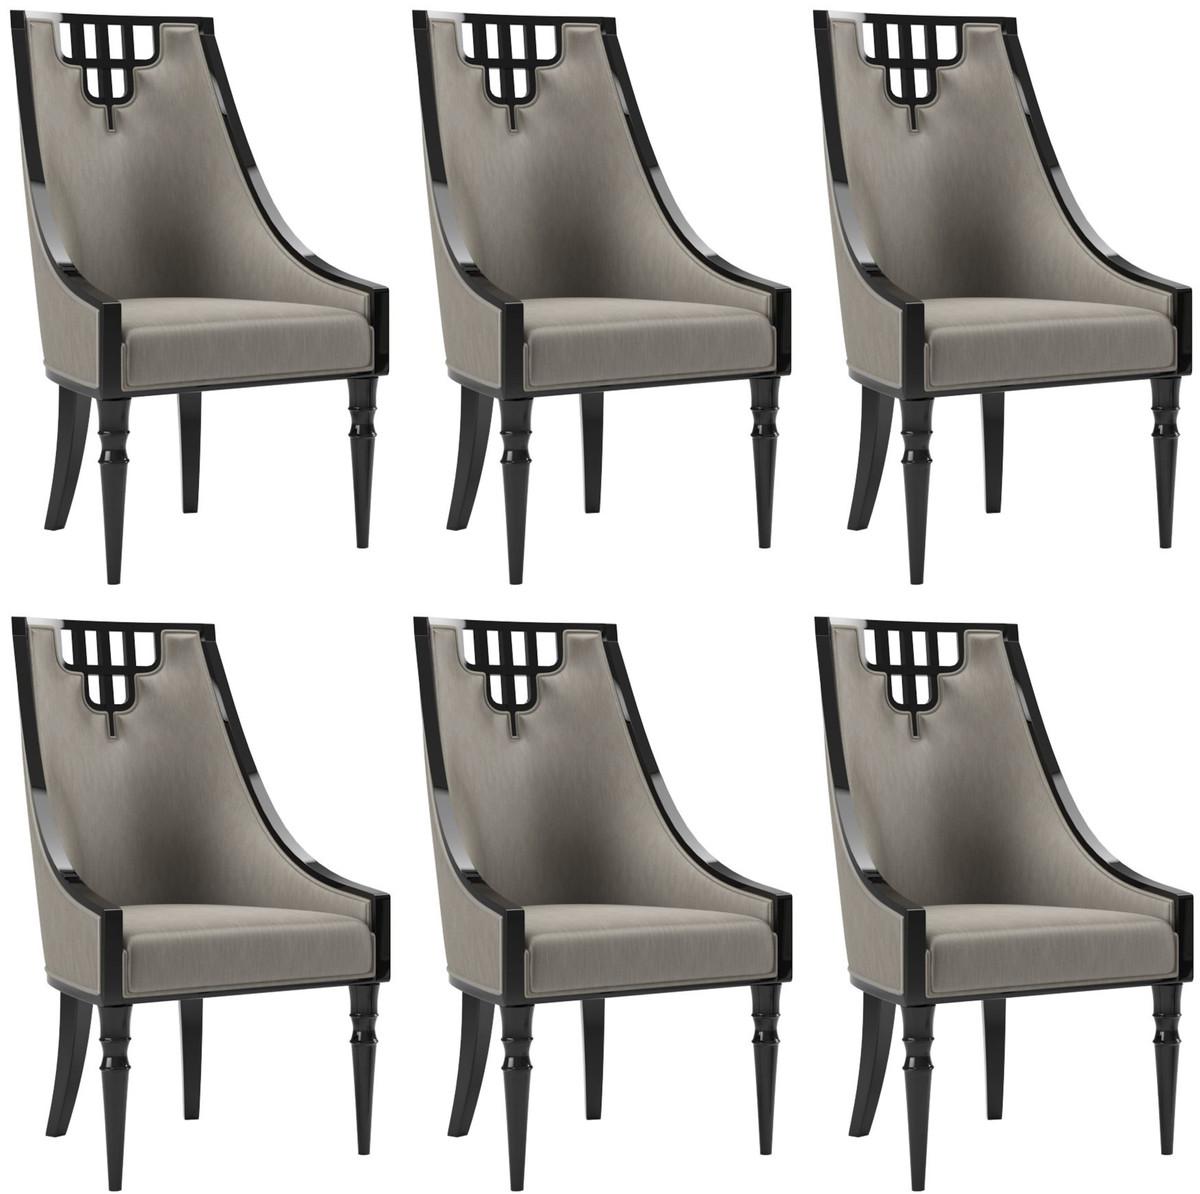 Casa Padrino Luxury Art Deco Dining Chair Set Gray Black 55 X 55 X H 105 Cm Noble Kitchen Chairs Set Of 6 Art Deco Dining Room Furniture